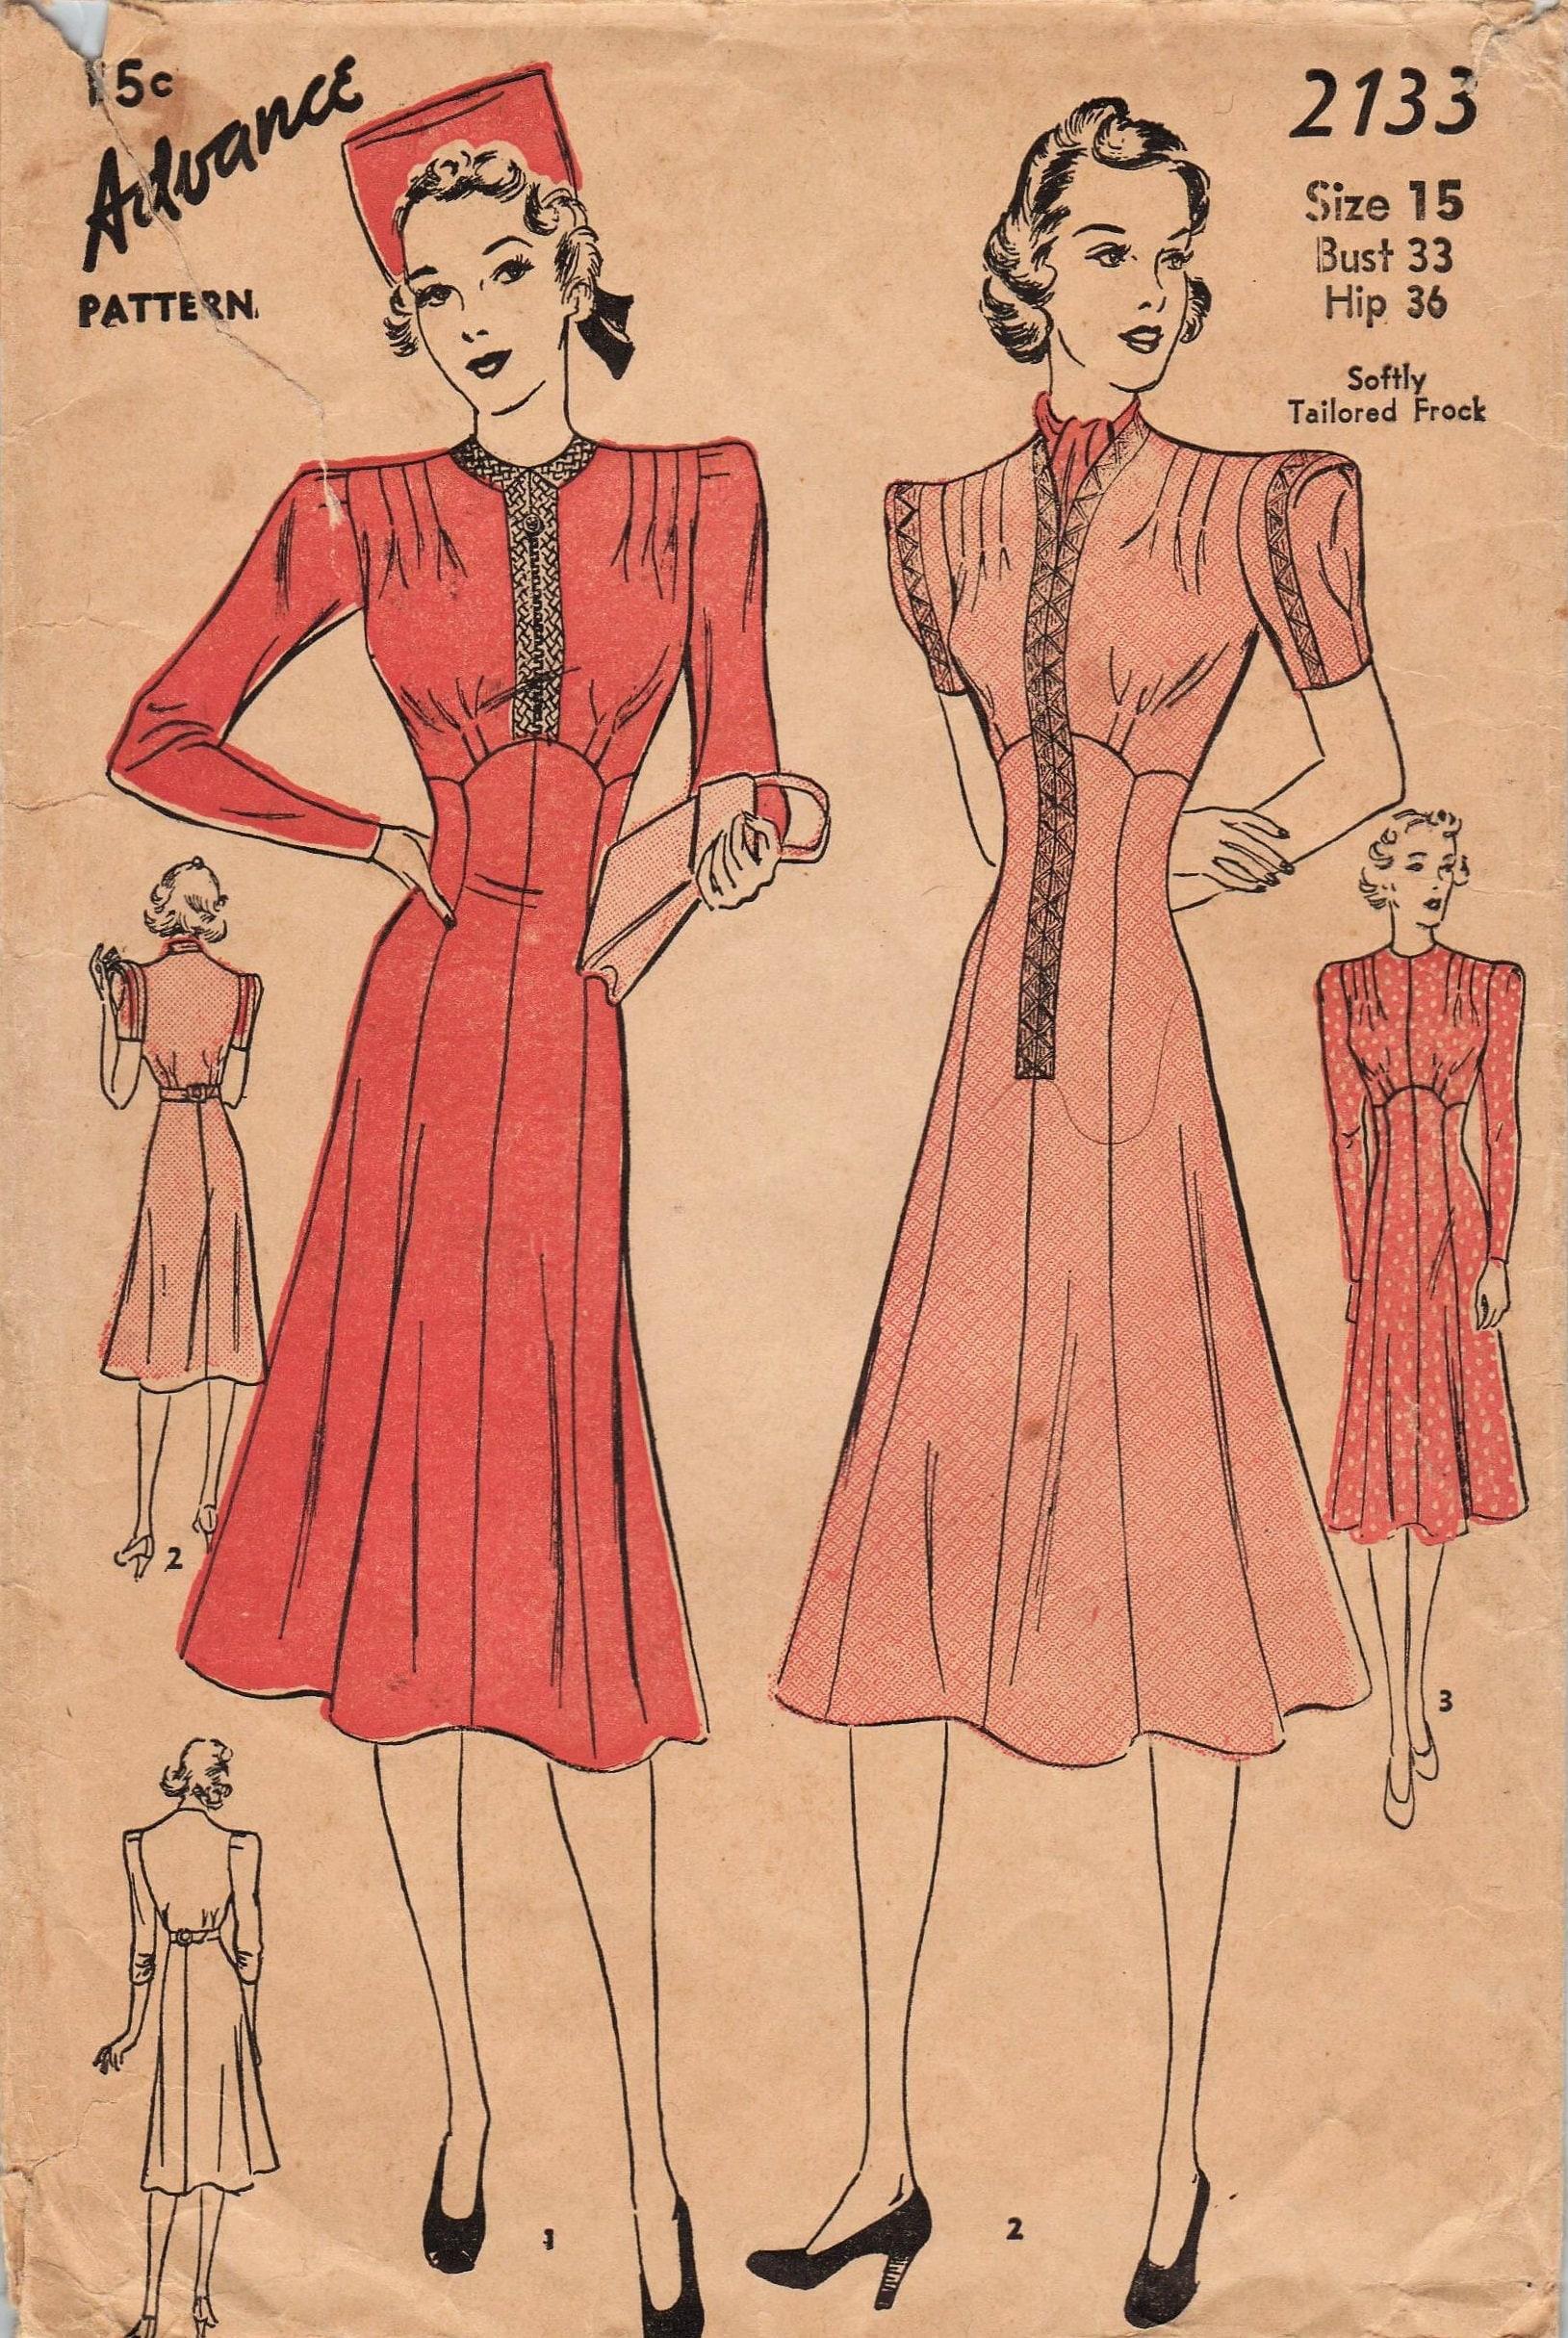 Advance 2133 vintage 1930s sewing pattern dress size 15 description this vintage advance sewing pattern jeuxipadfo Choice Image